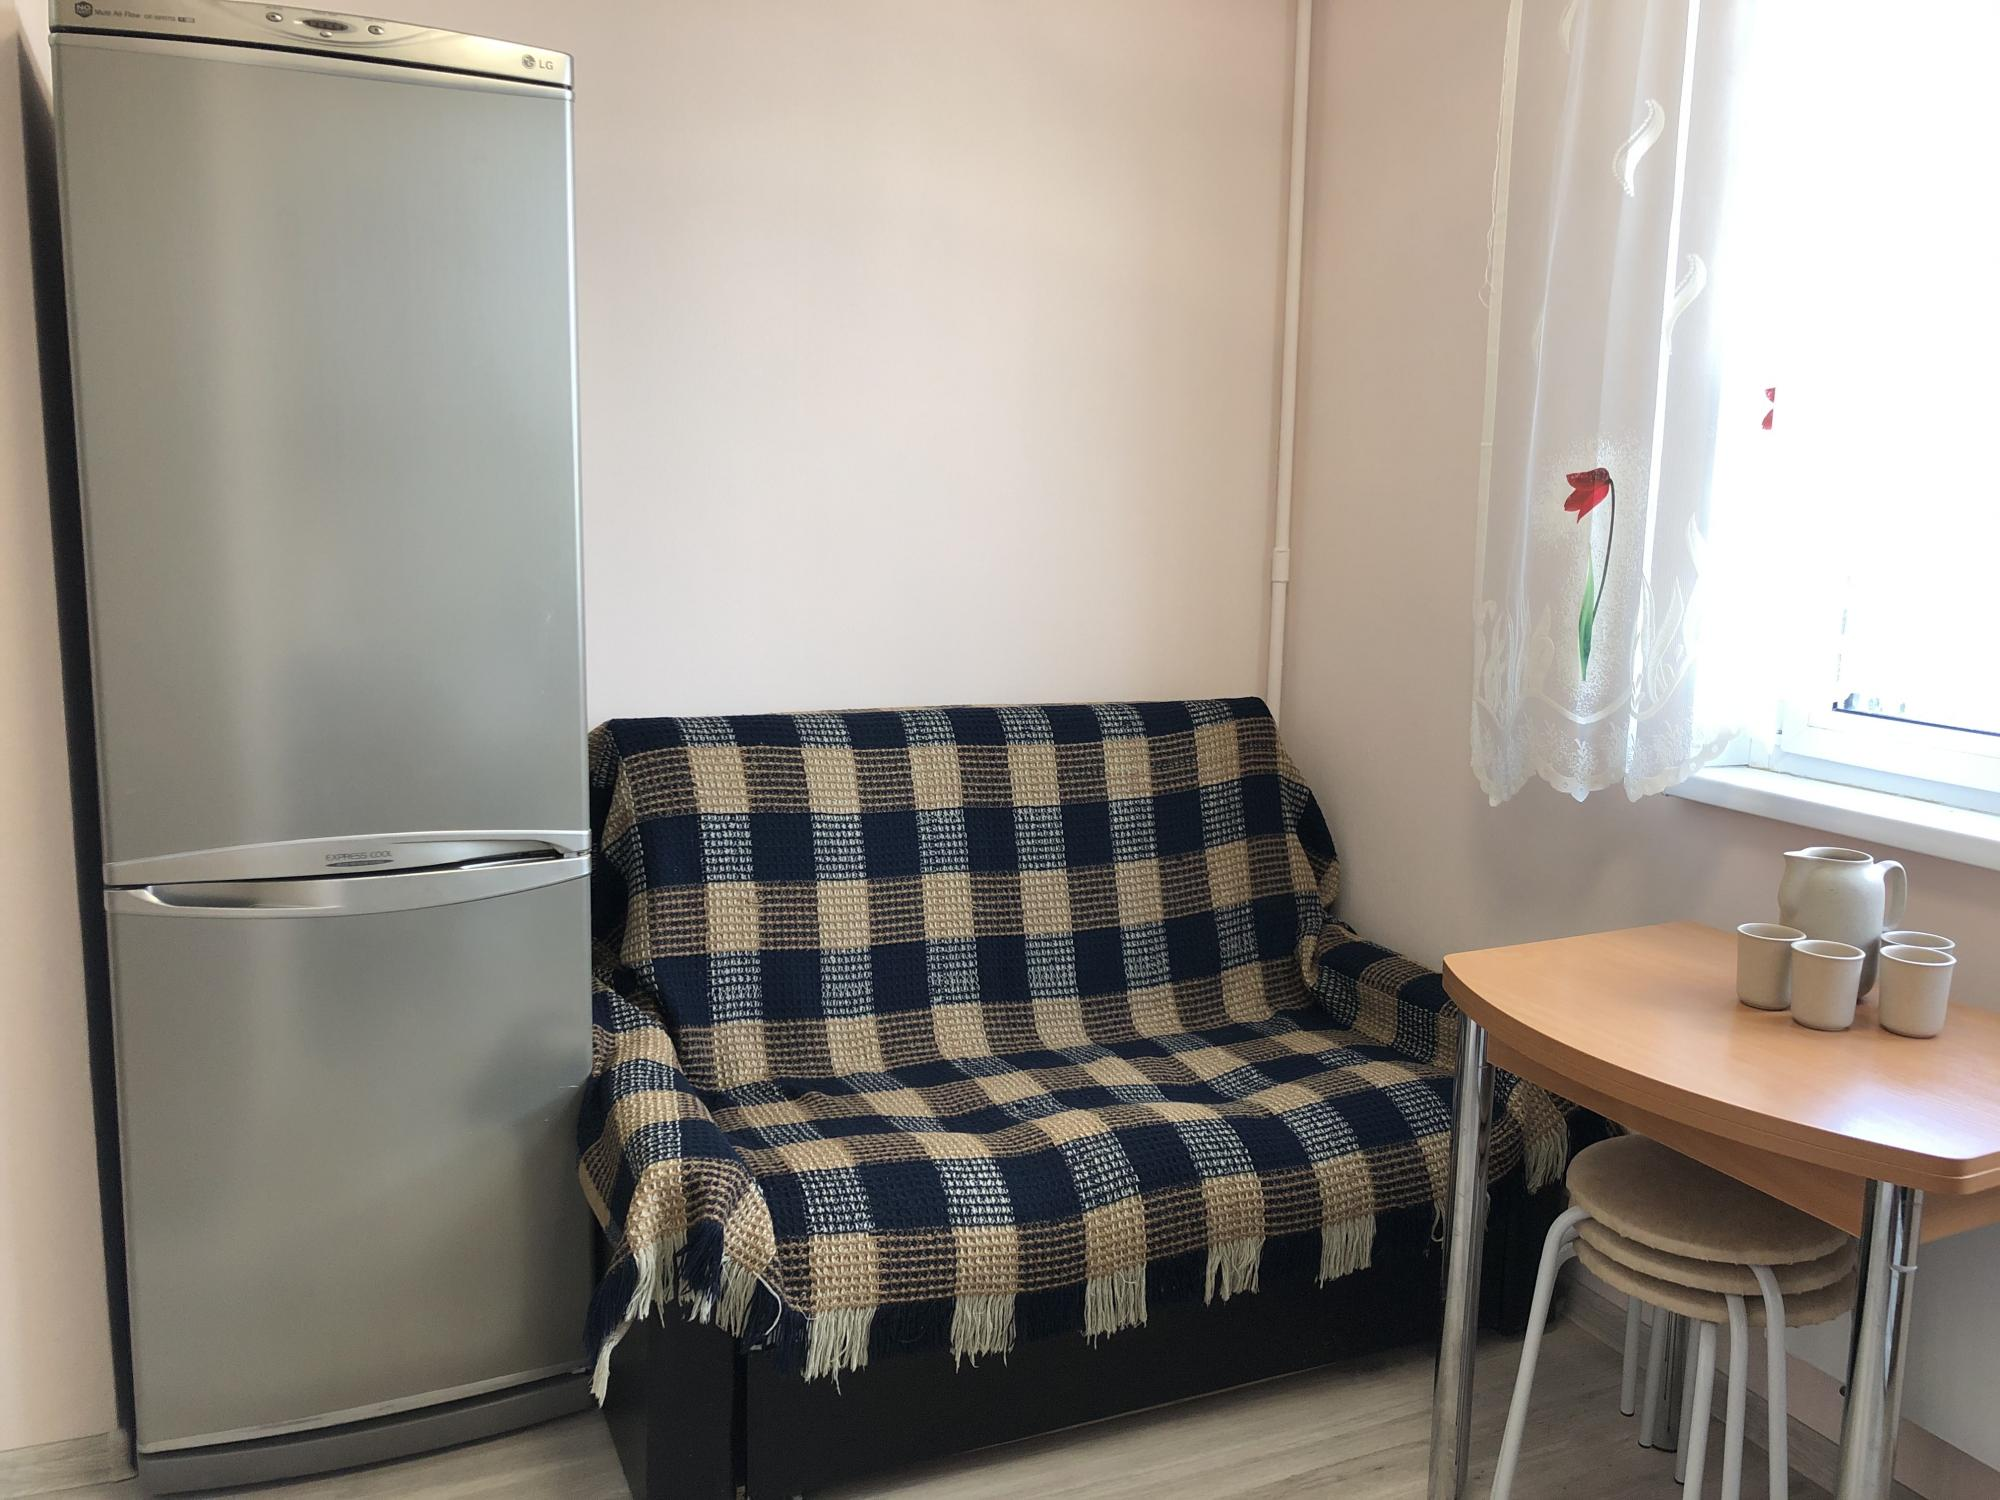 Квартира, 1 комната, 38.5 м² в Юбилейном 89261770666 купить 10